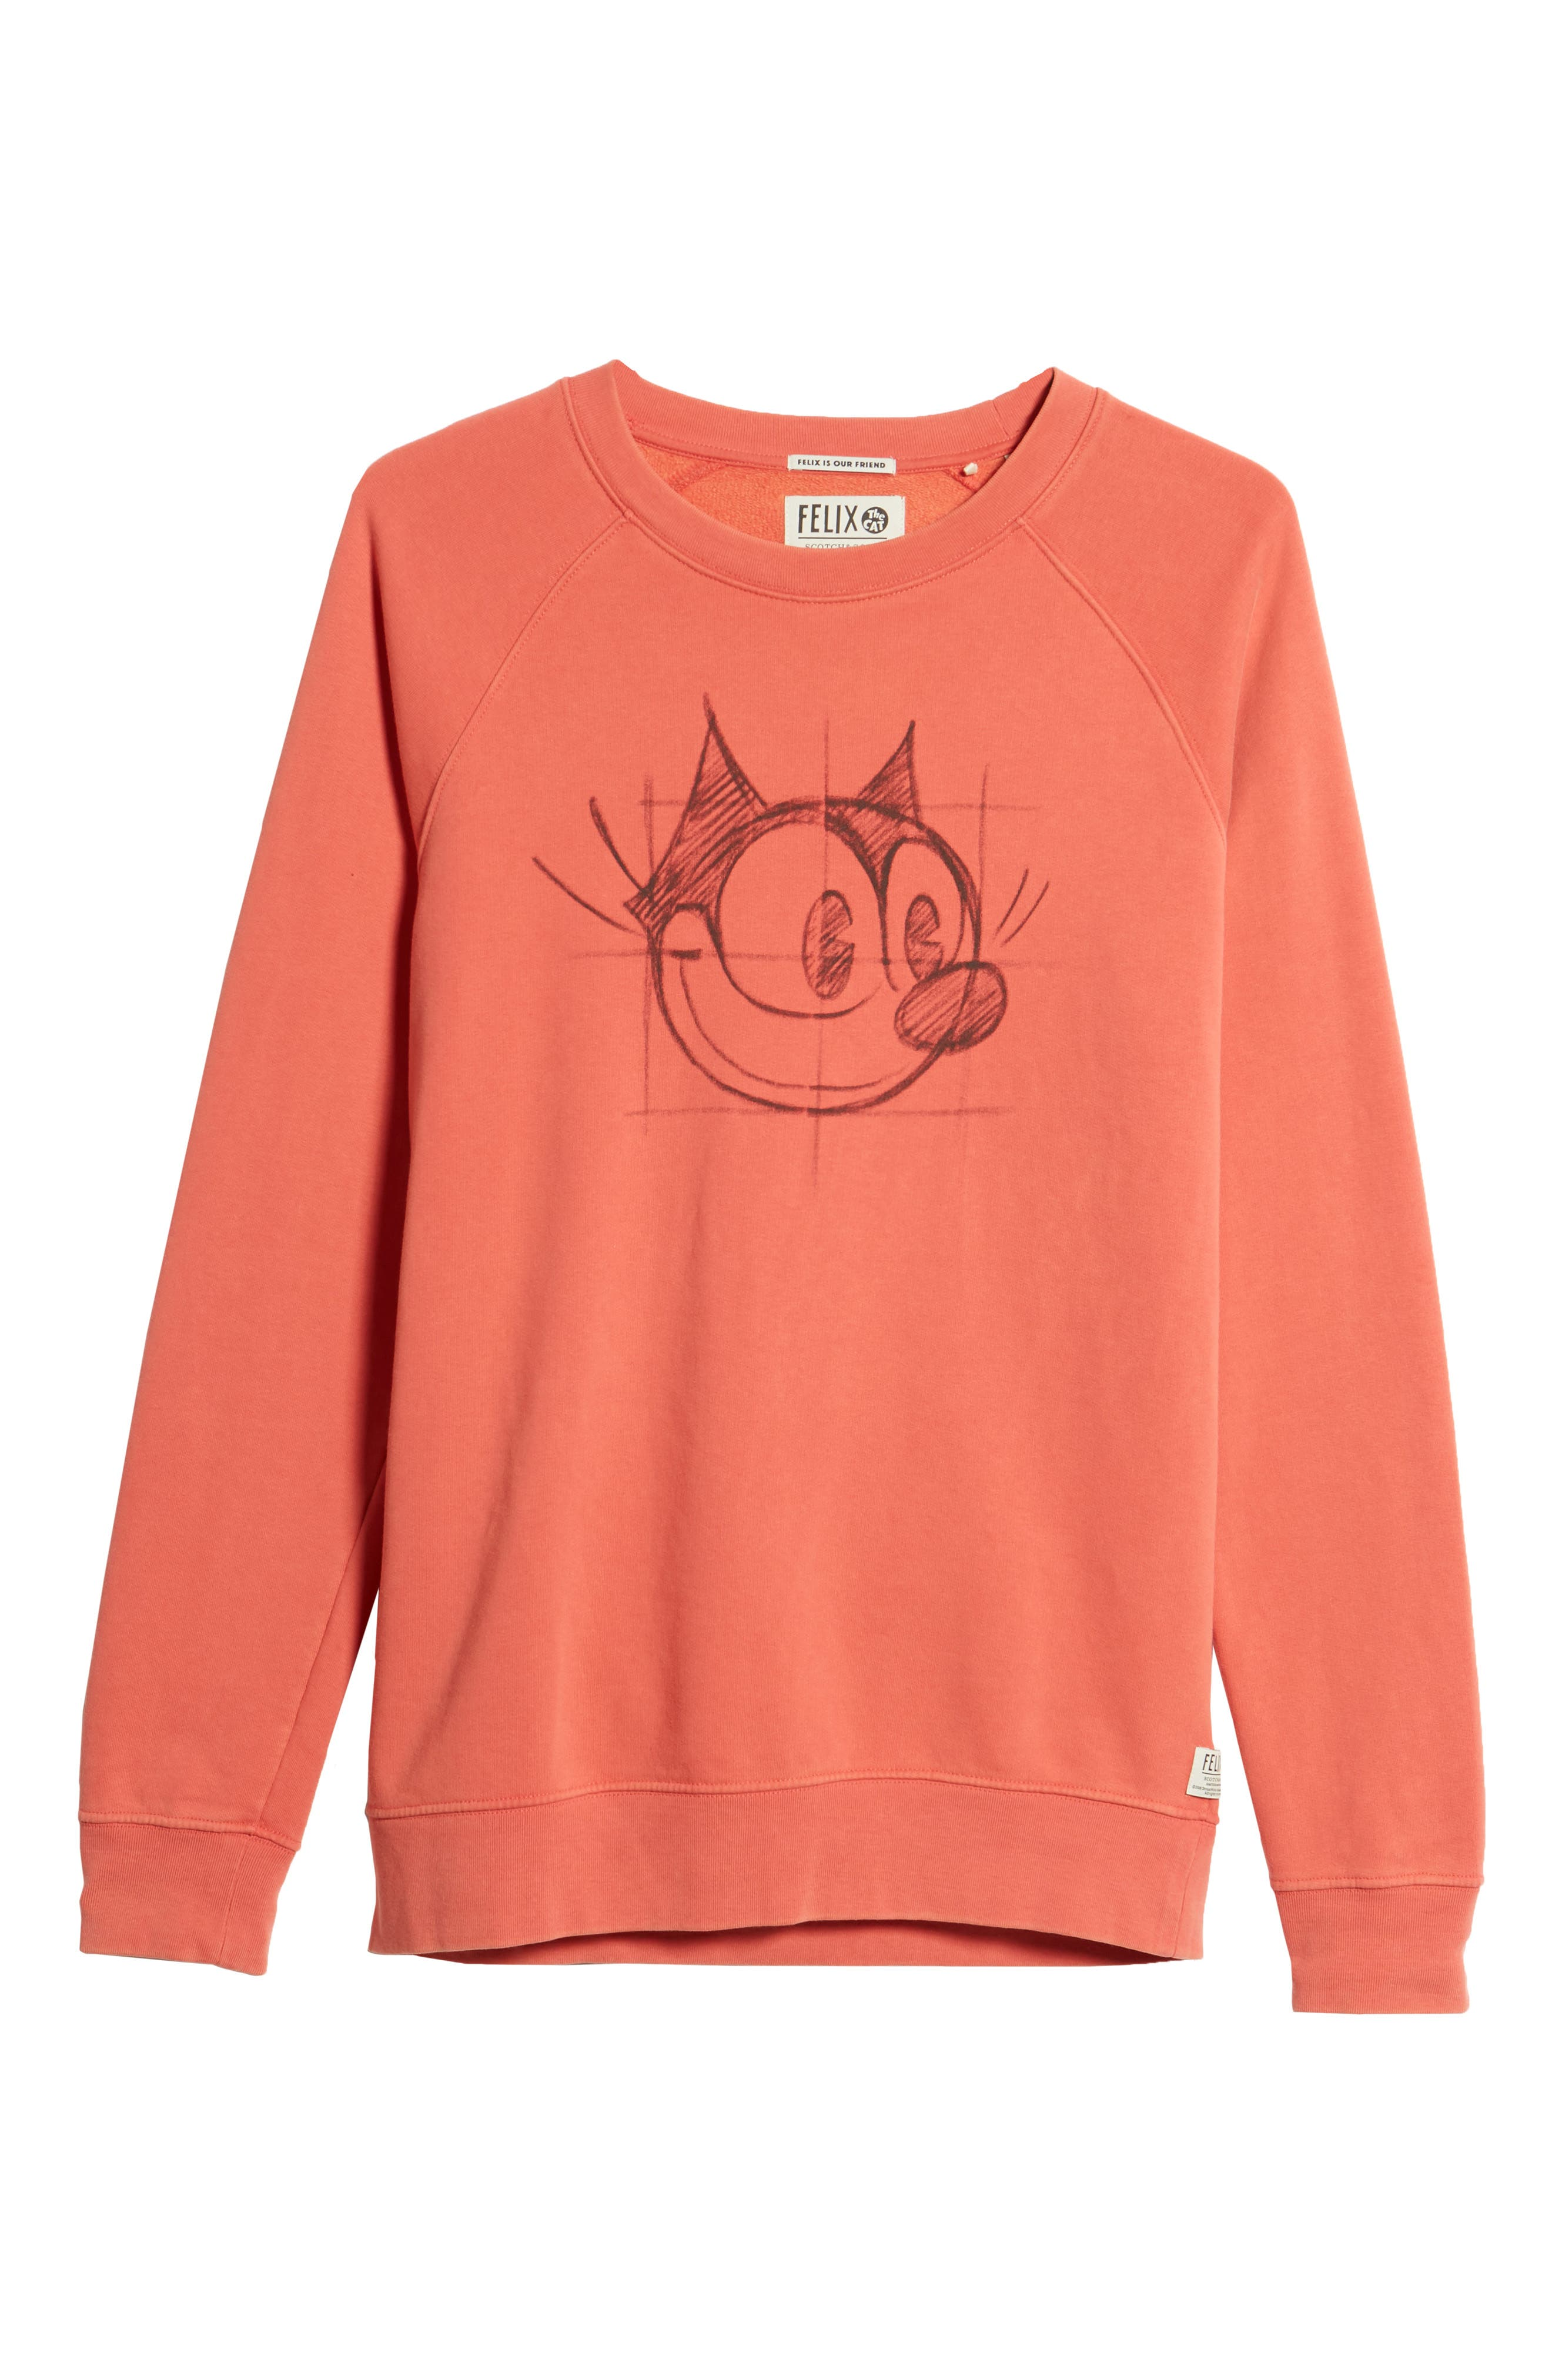 Amsterdams Blauw Felix the Cat Graphic Sweatshirt,                             Alternate thumbnail 6, color,                             RED GLOW